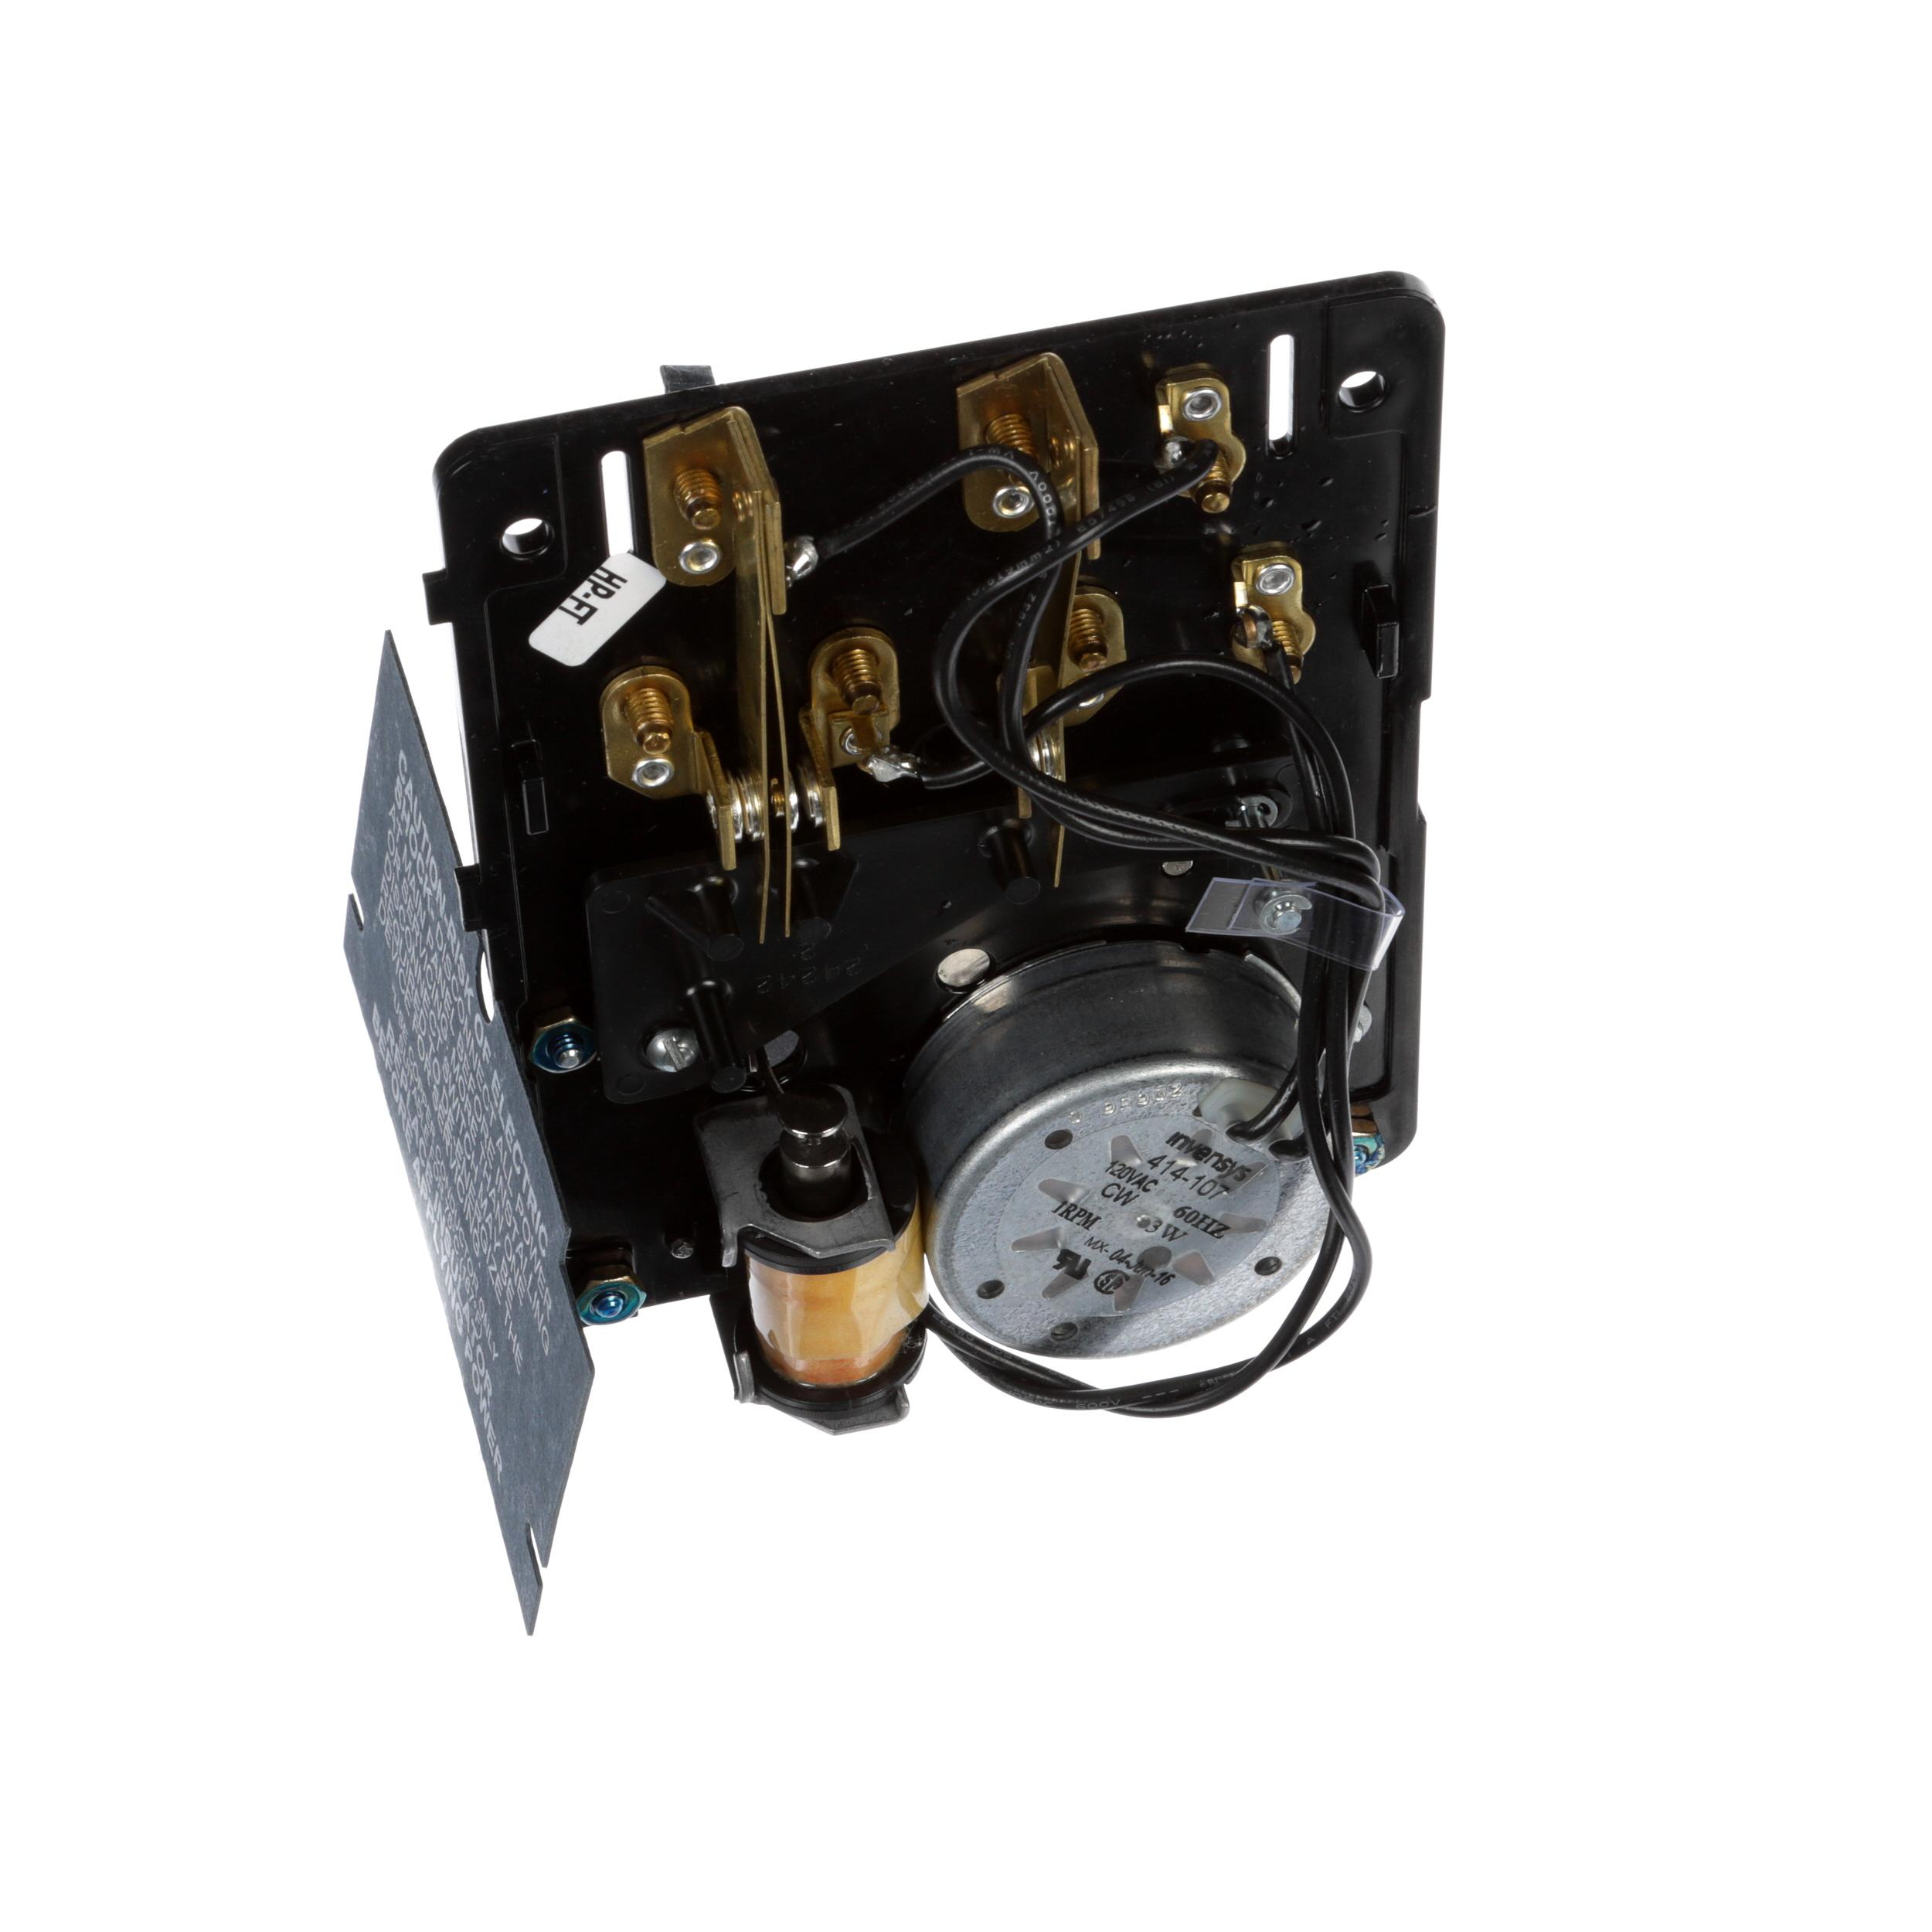 beverage air timer defrost 120 60 par part 502 115a rh heritageparts com